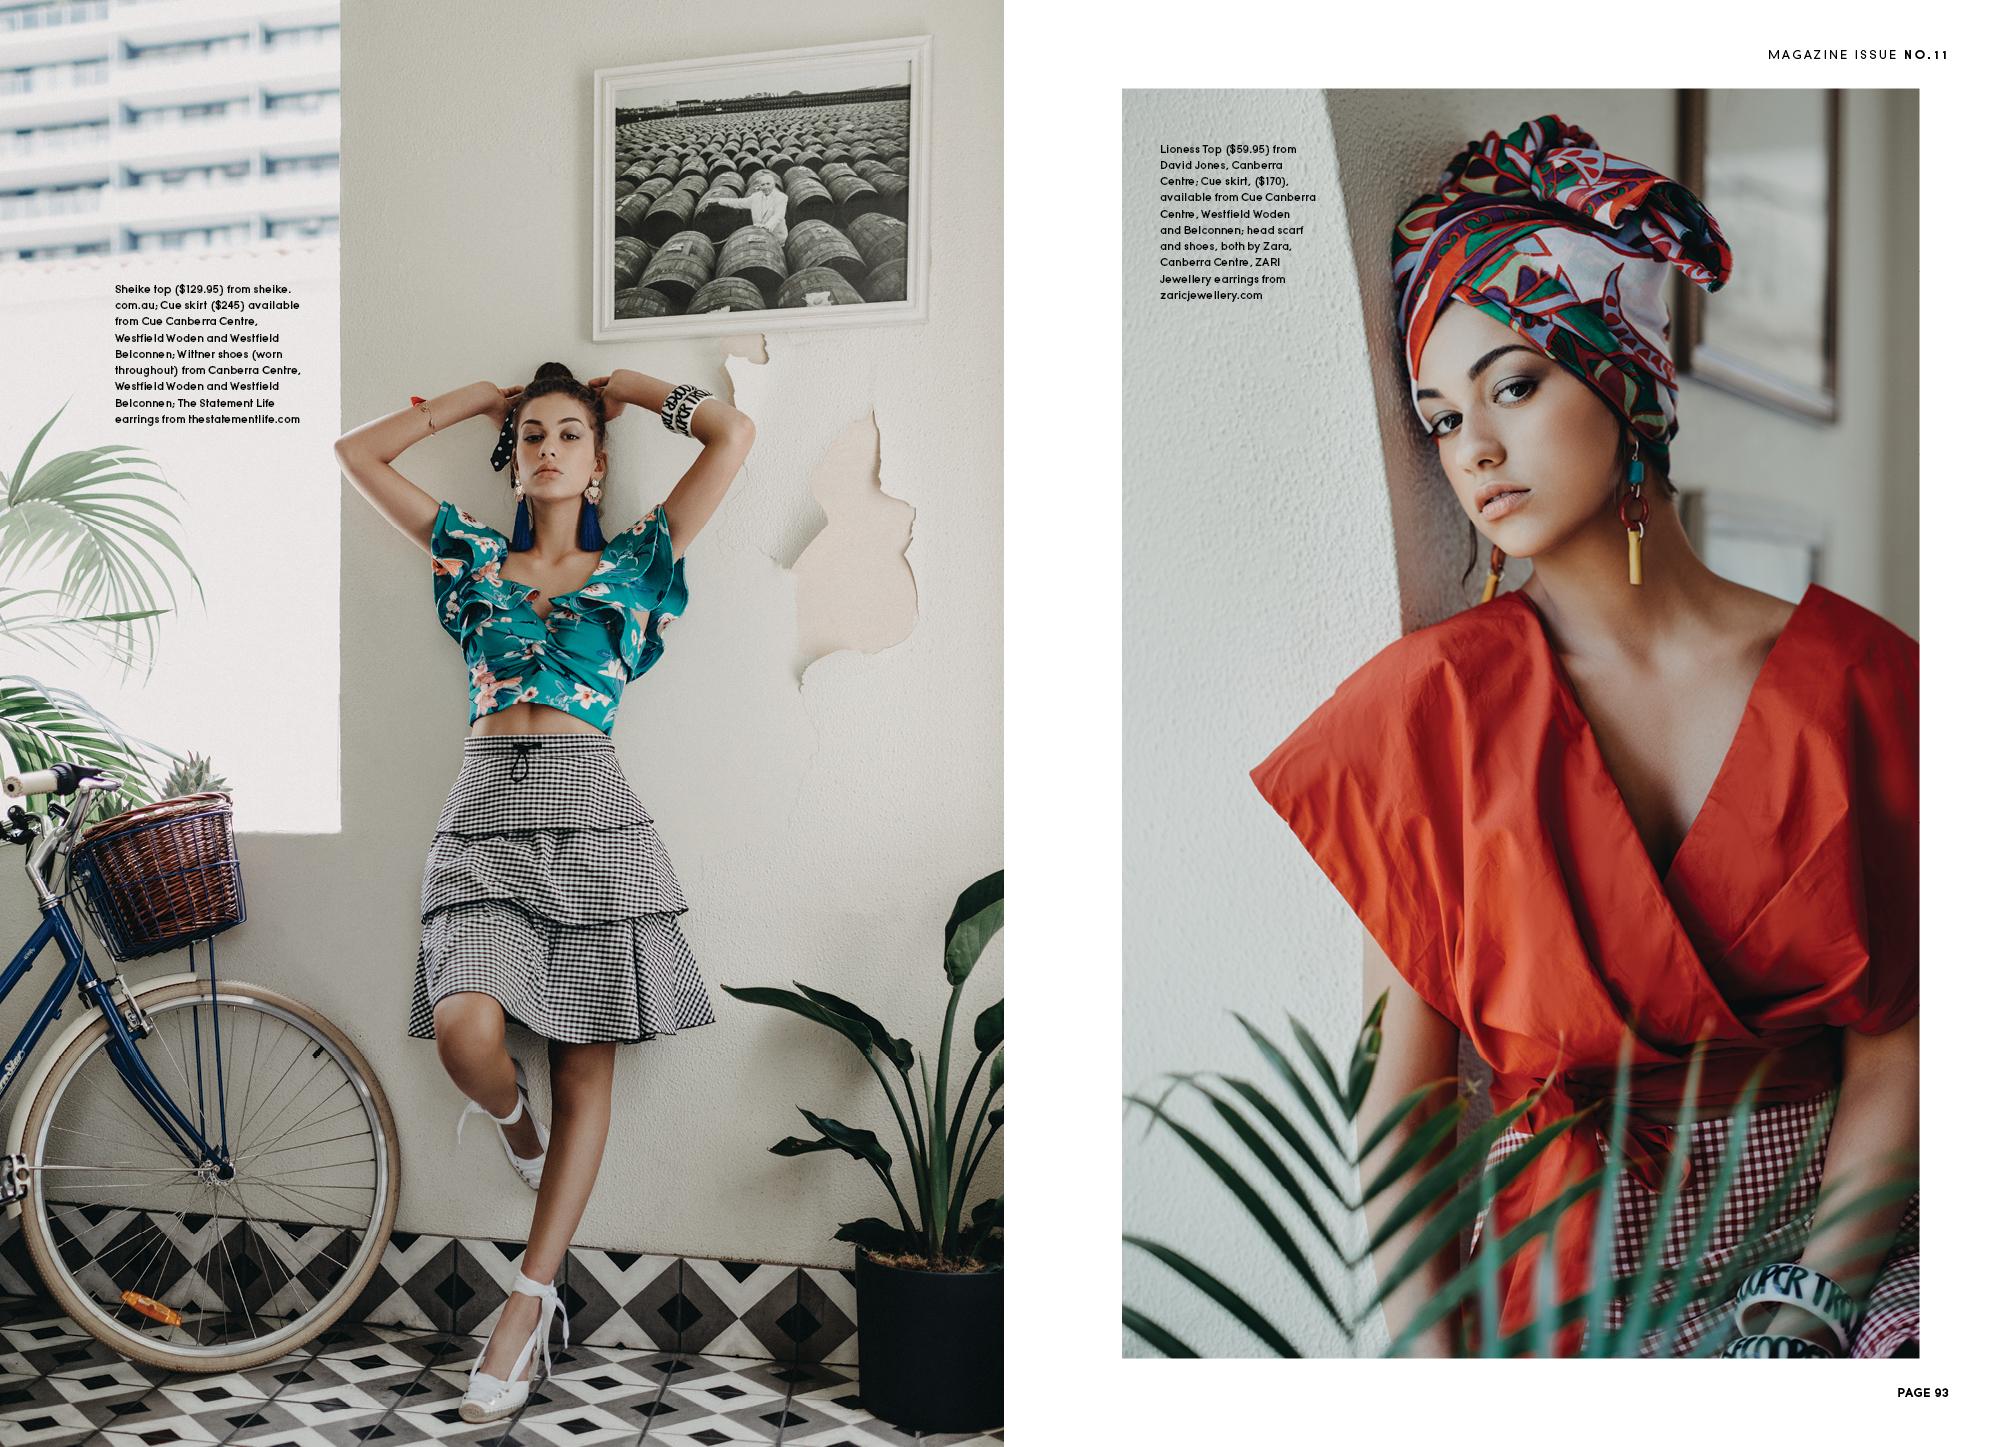 HC_02094_Magazine_Issue_11_Fashion_5.jpg